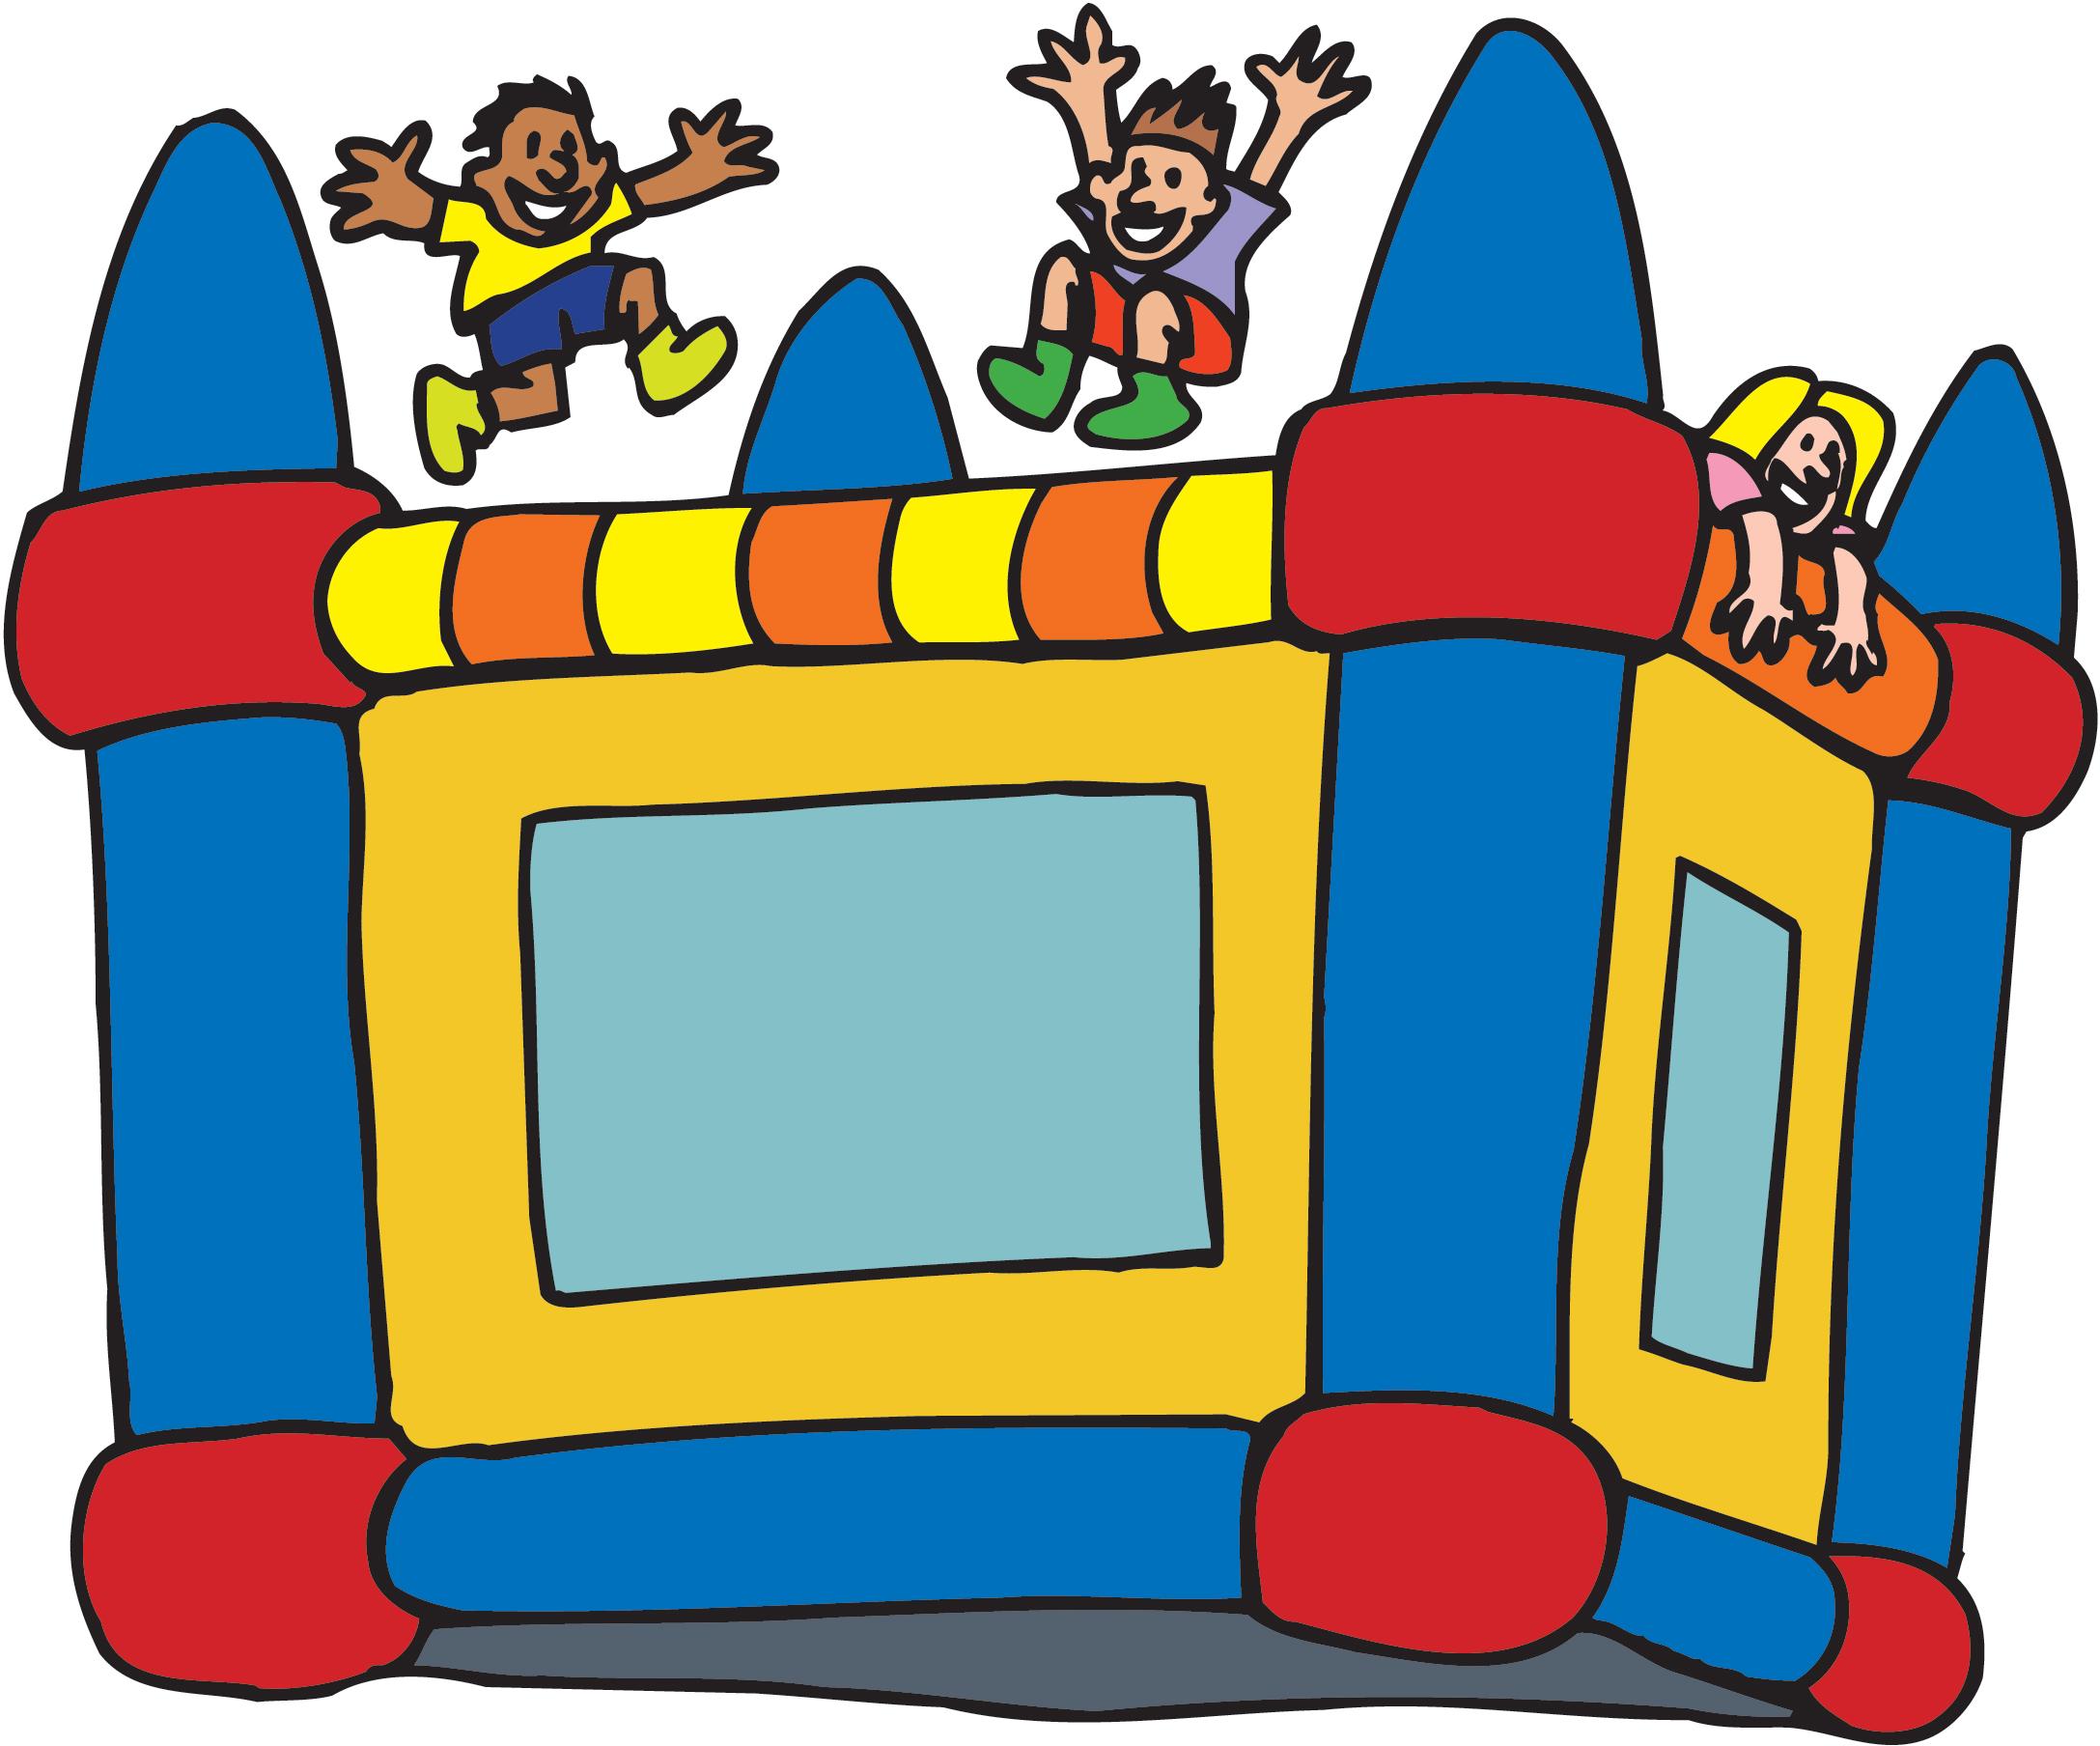 Free bouncy castle clipart clip art freeuse library Bouncy Castle Clipart   Free download best Bouncy Castle Clipart on ... clip art freeuse library